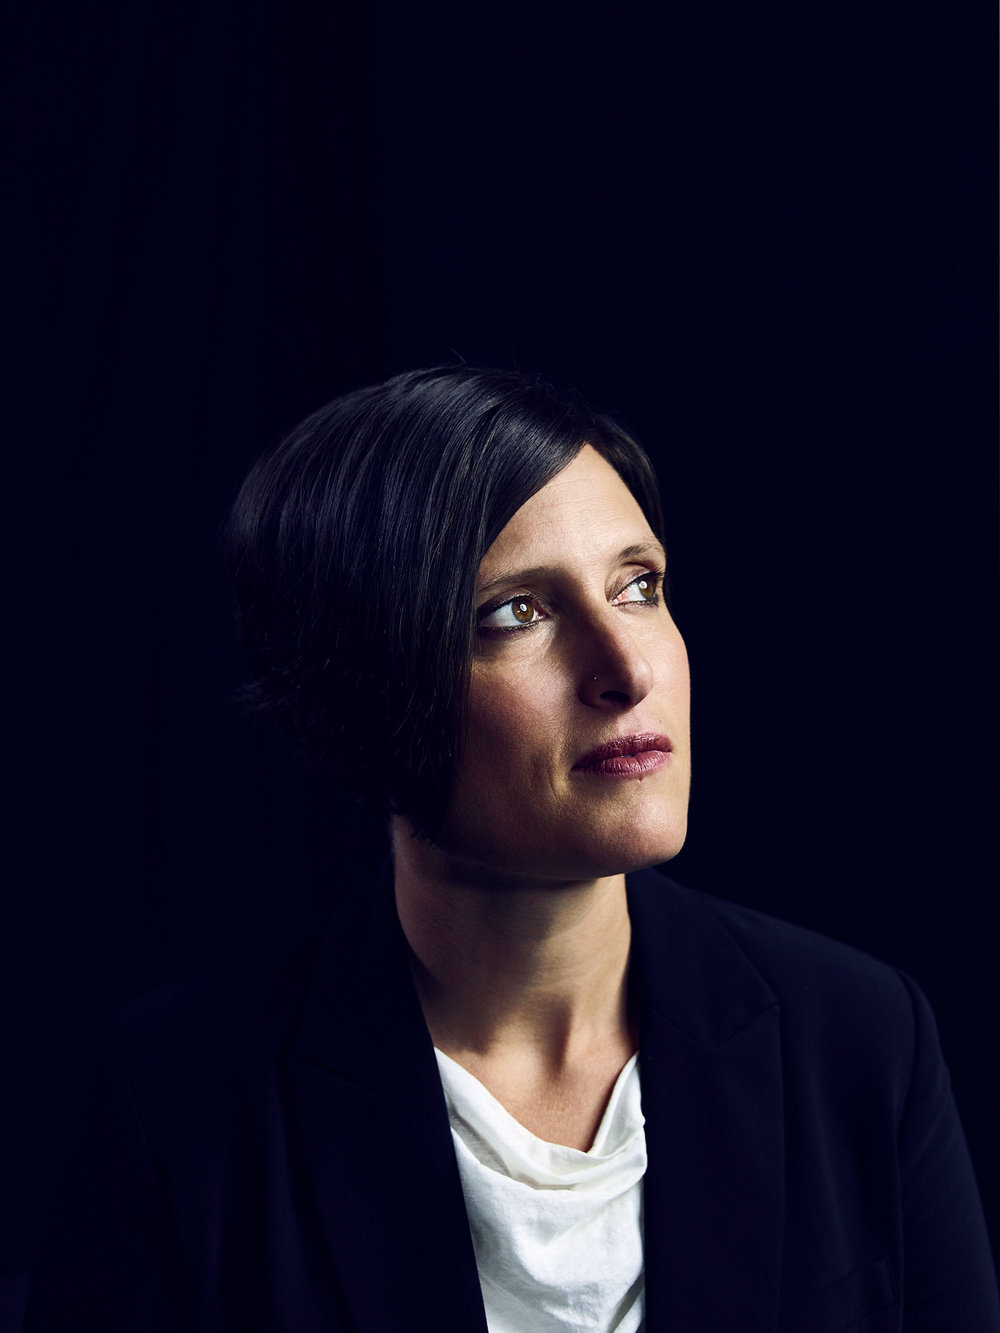 Rachel Morrison, Cinematographer